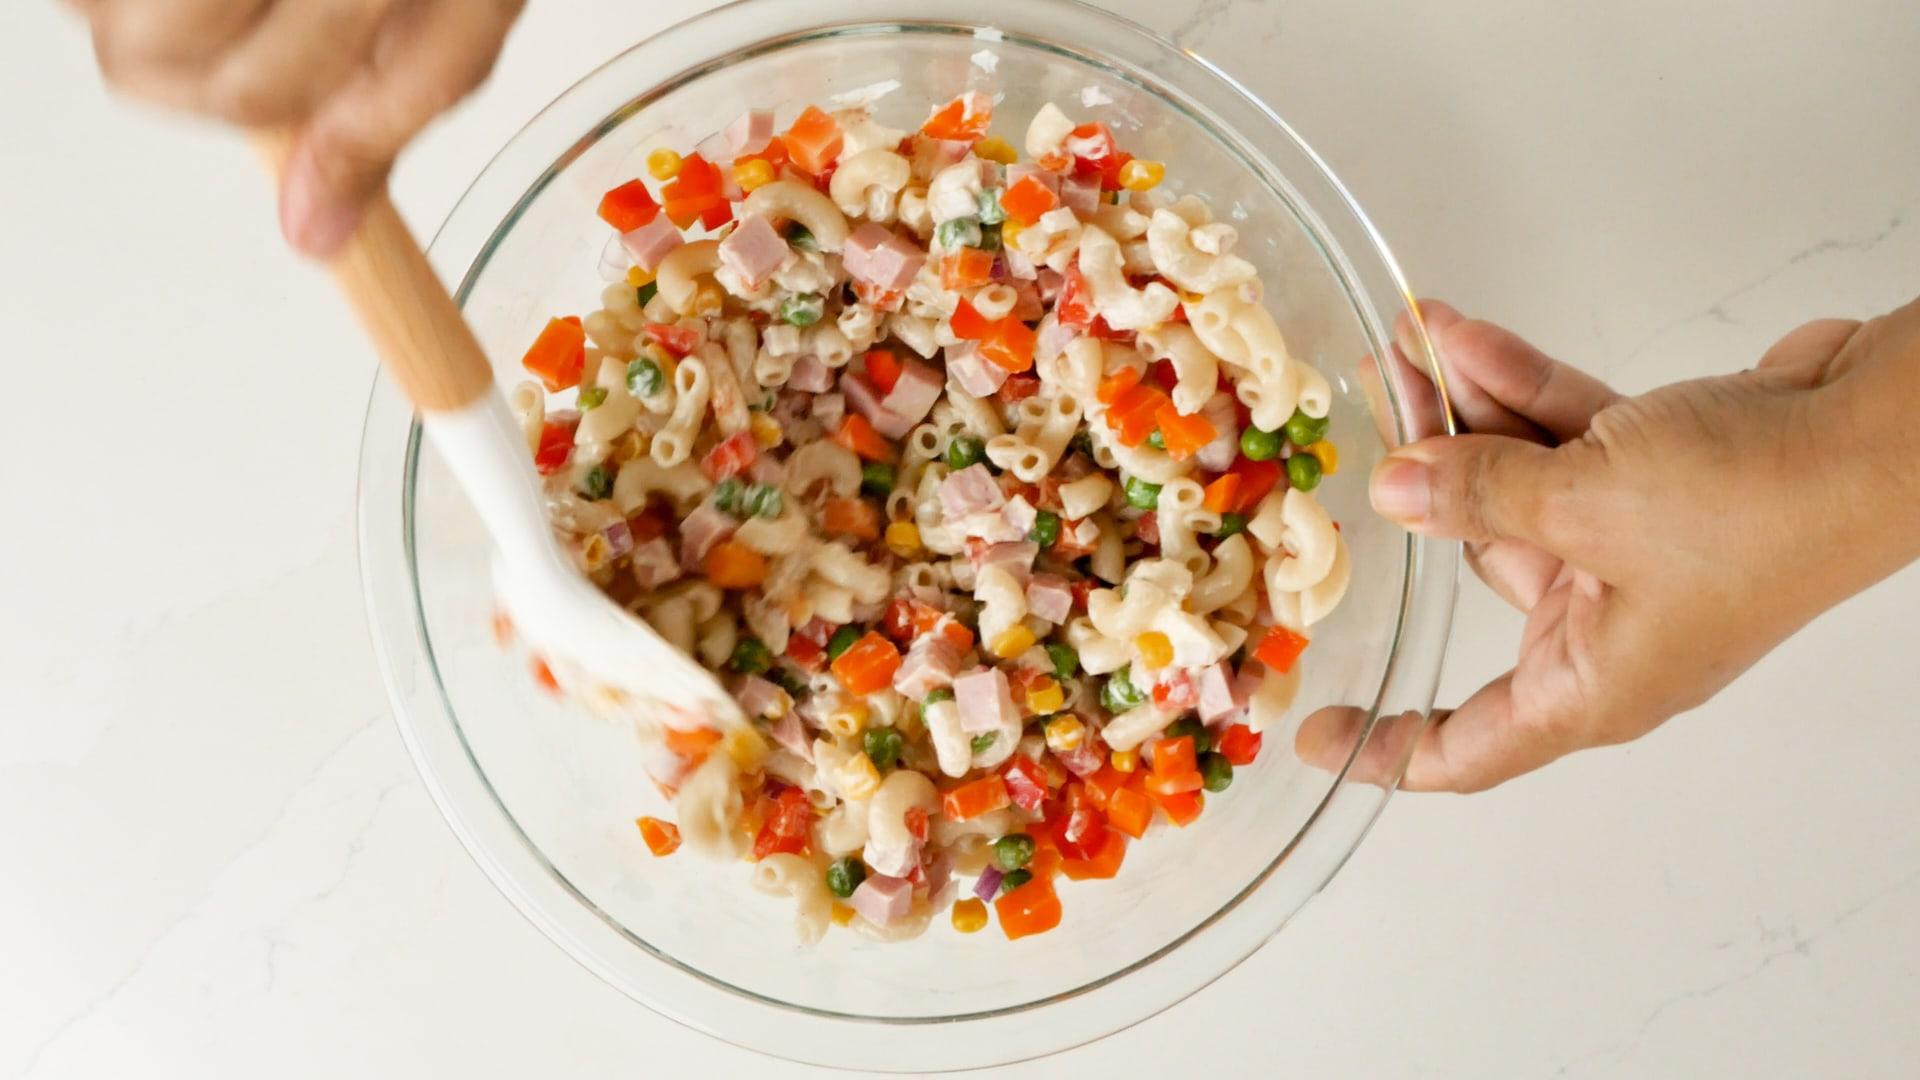 Salad mixed ready to serve